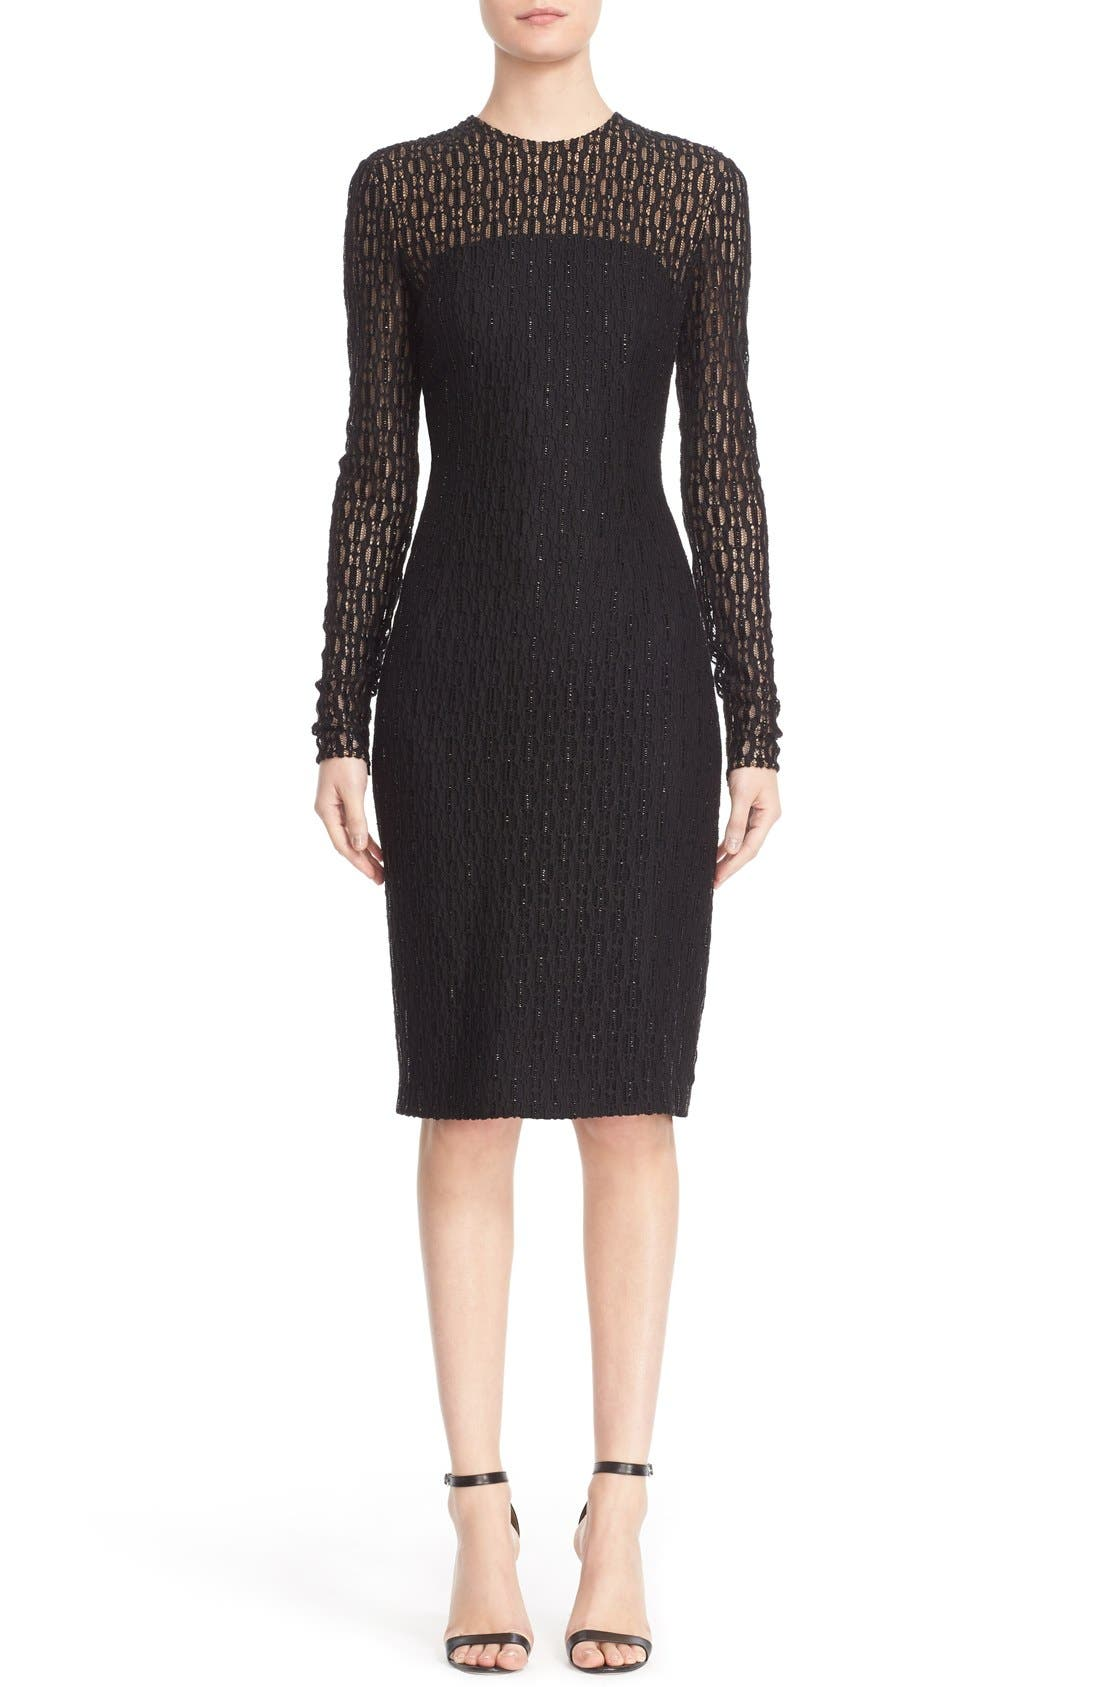 Embellished Illusion Lace Knit Sheath Dress,                         Main,                         color, 001